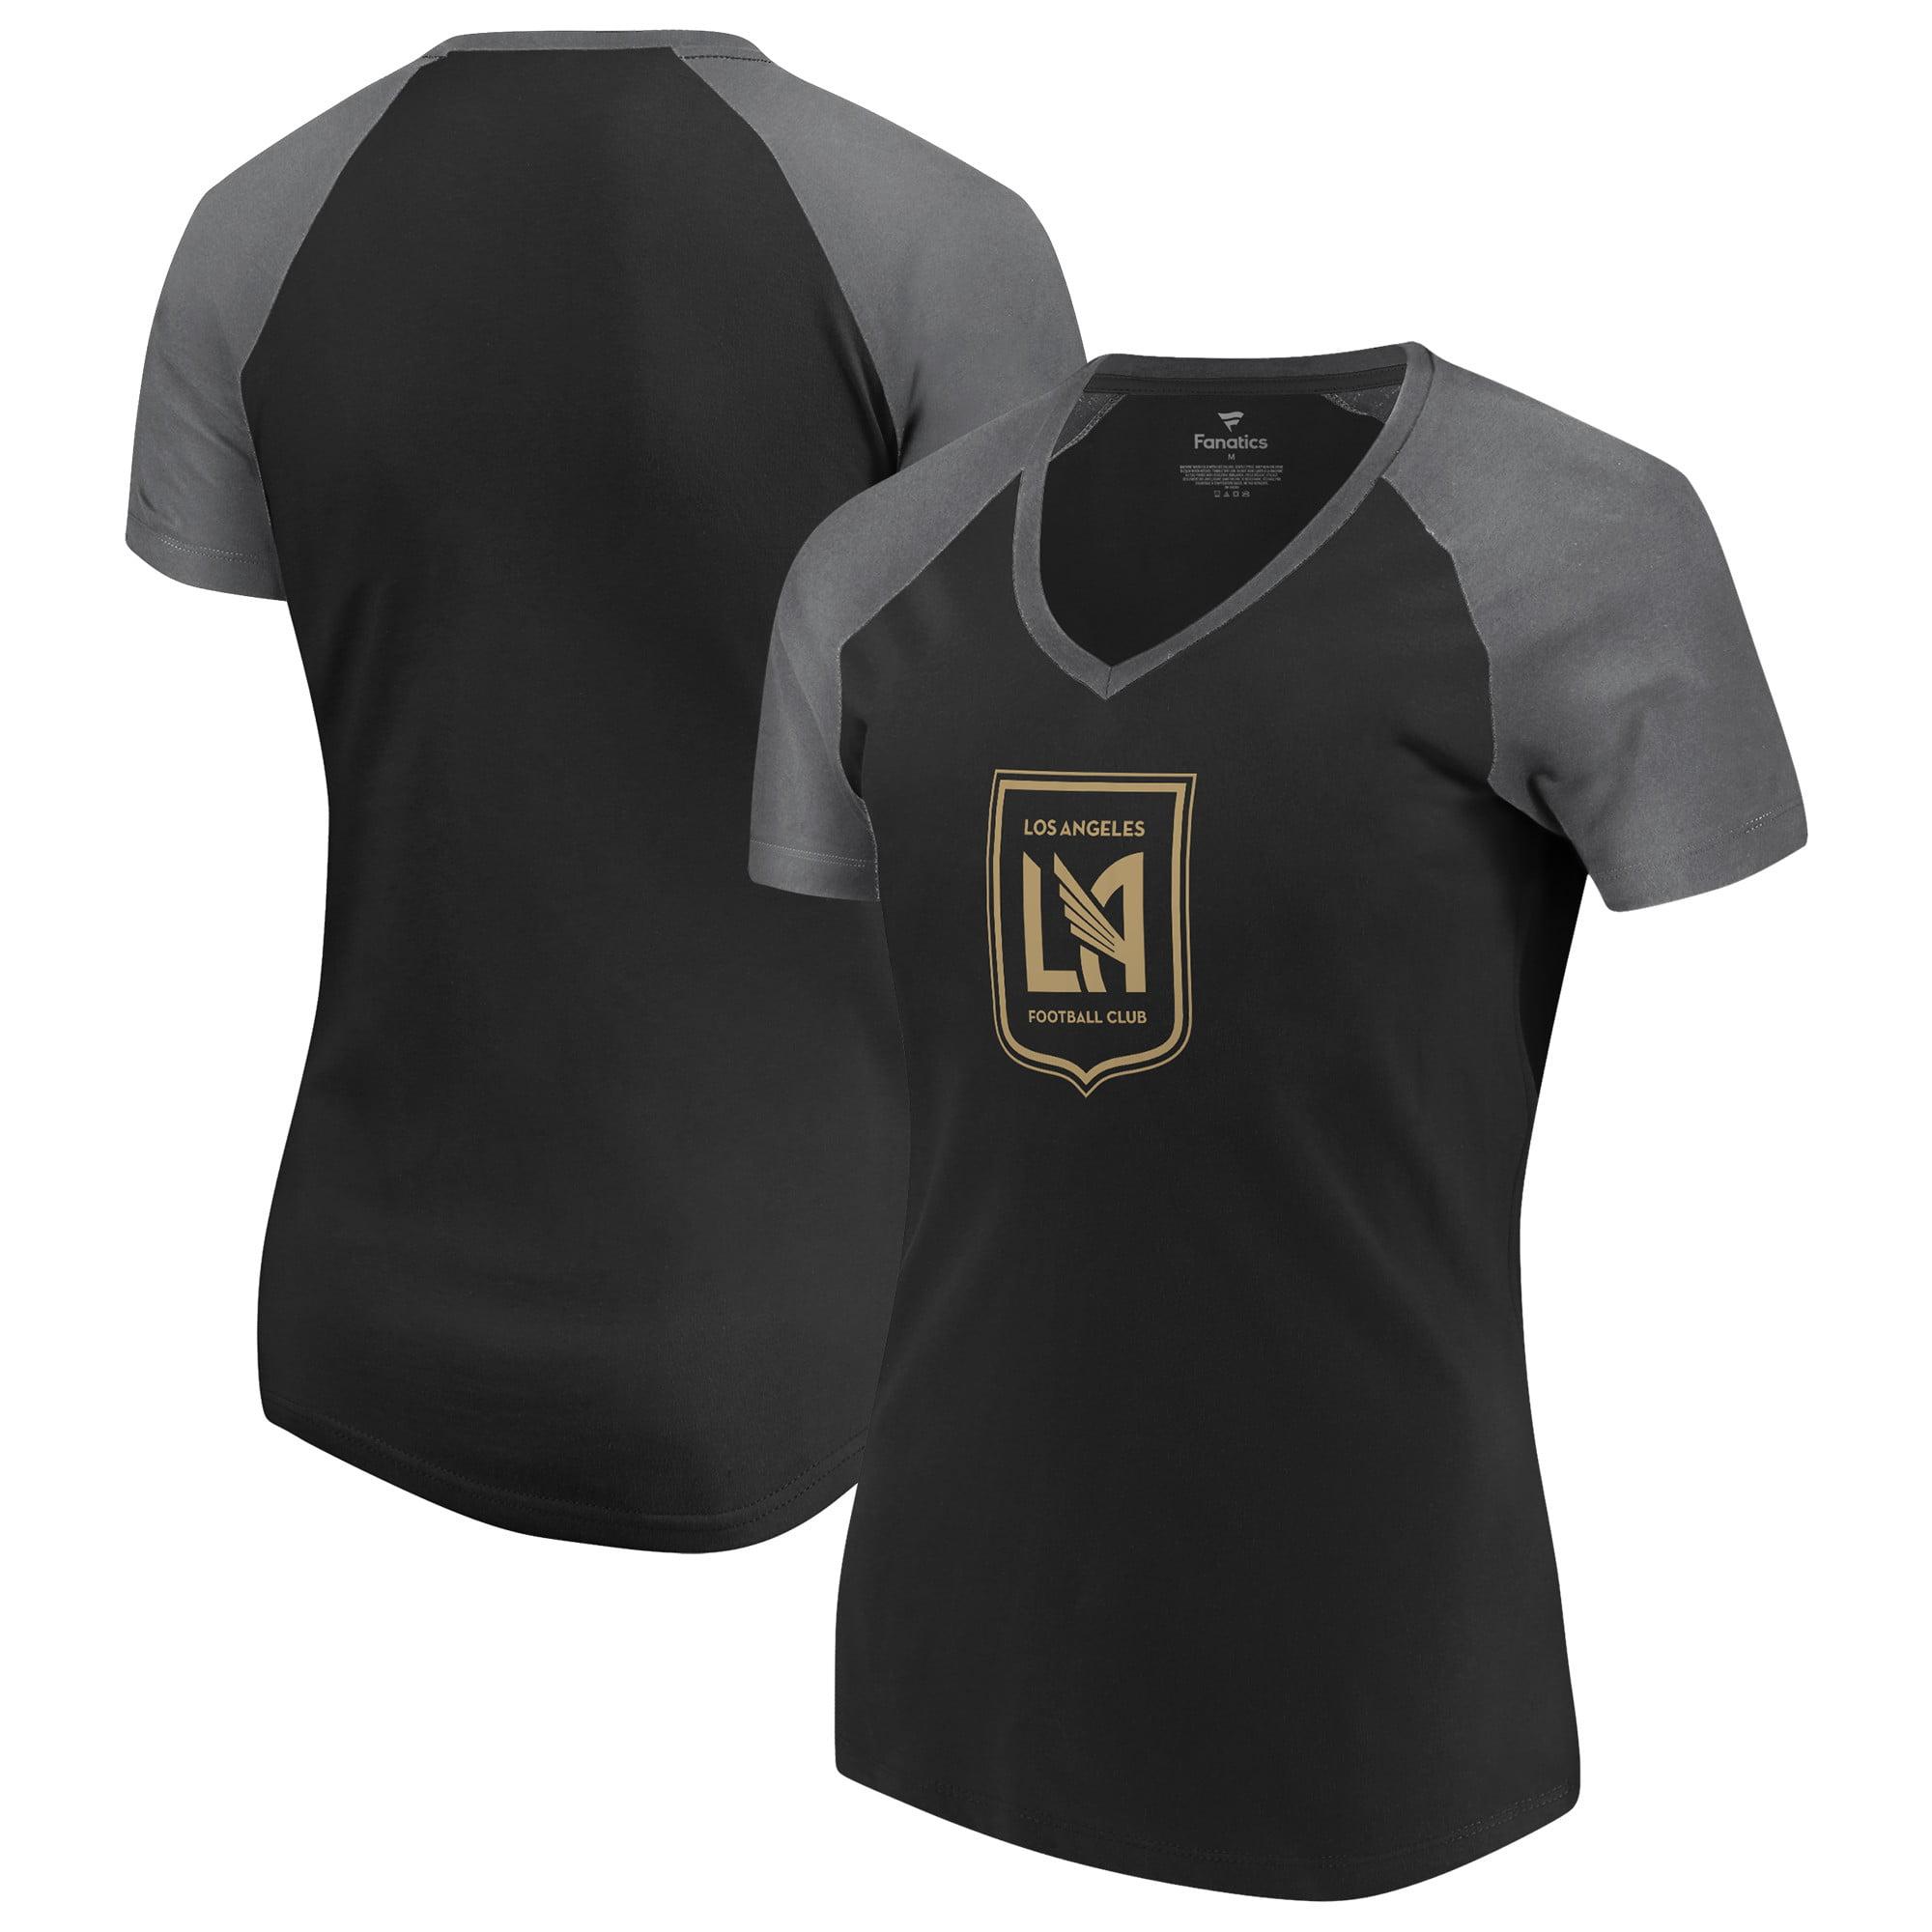 LAFC Fanatics Branded Women's Plus Size Iconic Paid our Dues Raglan V-Neck T-Shirt - Black/Gray